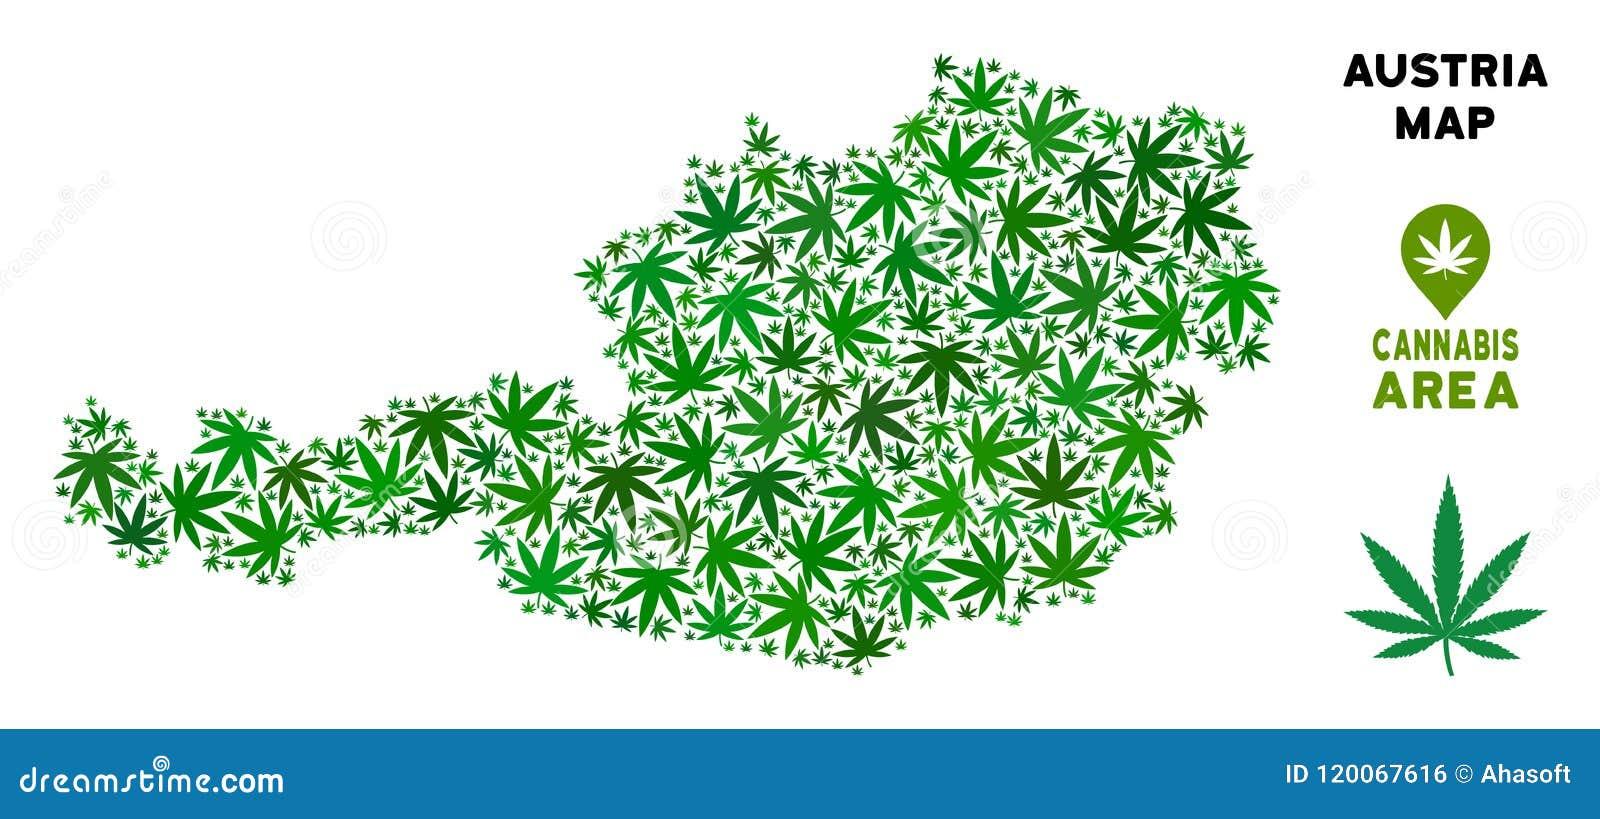 Vector Cannabis Mosaic Austria Map Stock Vector